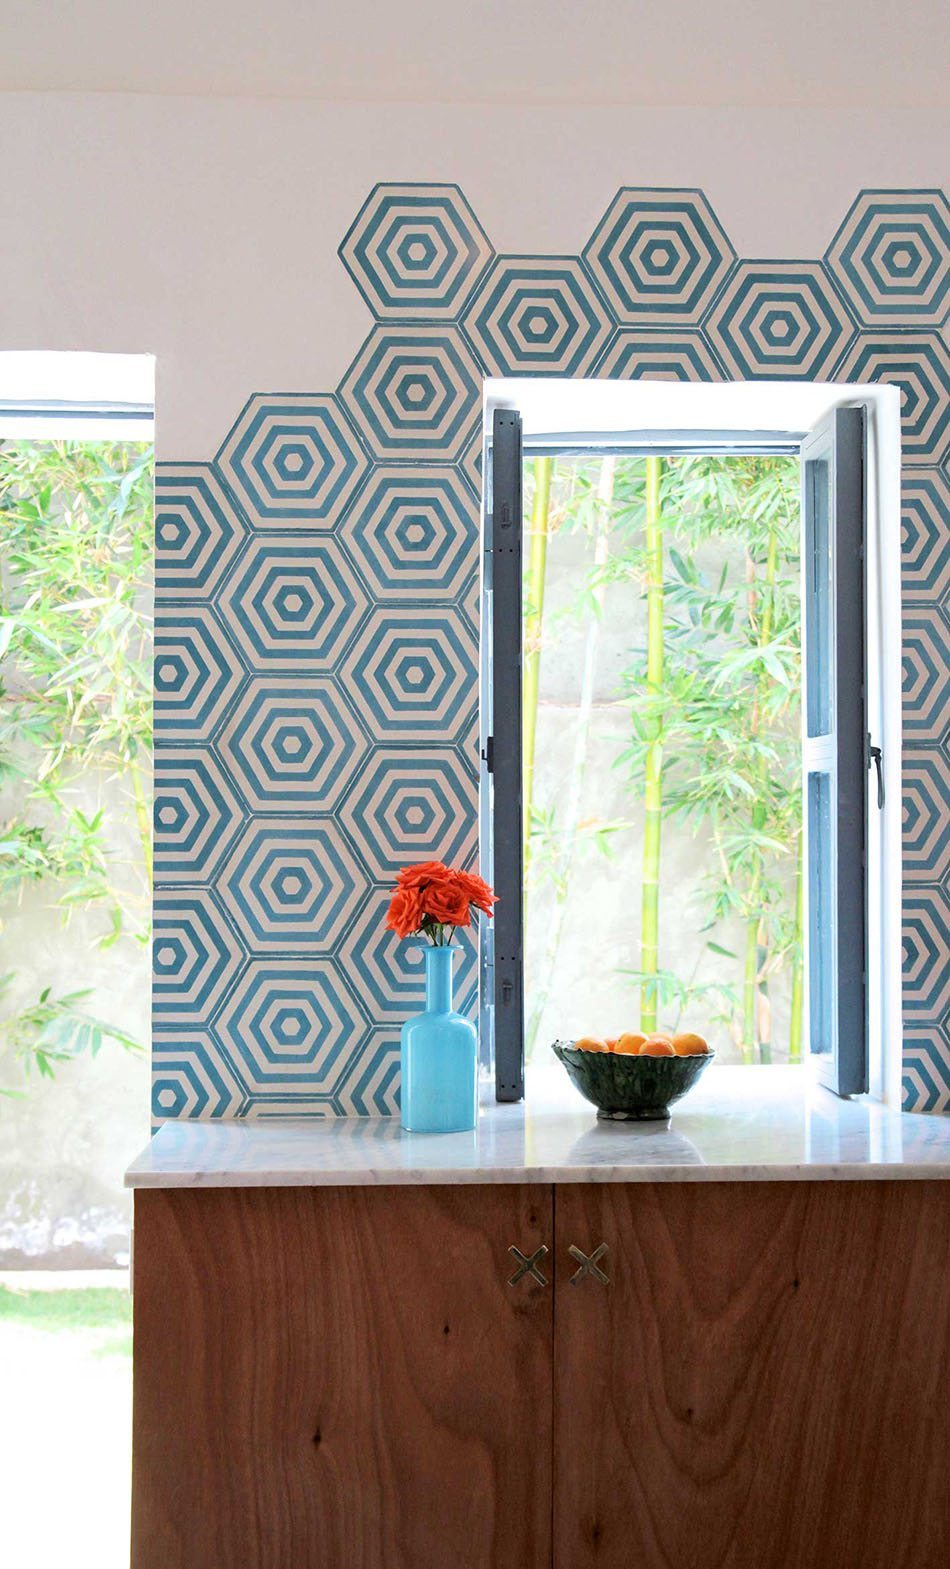 azulejos geometricos popham pared cocina